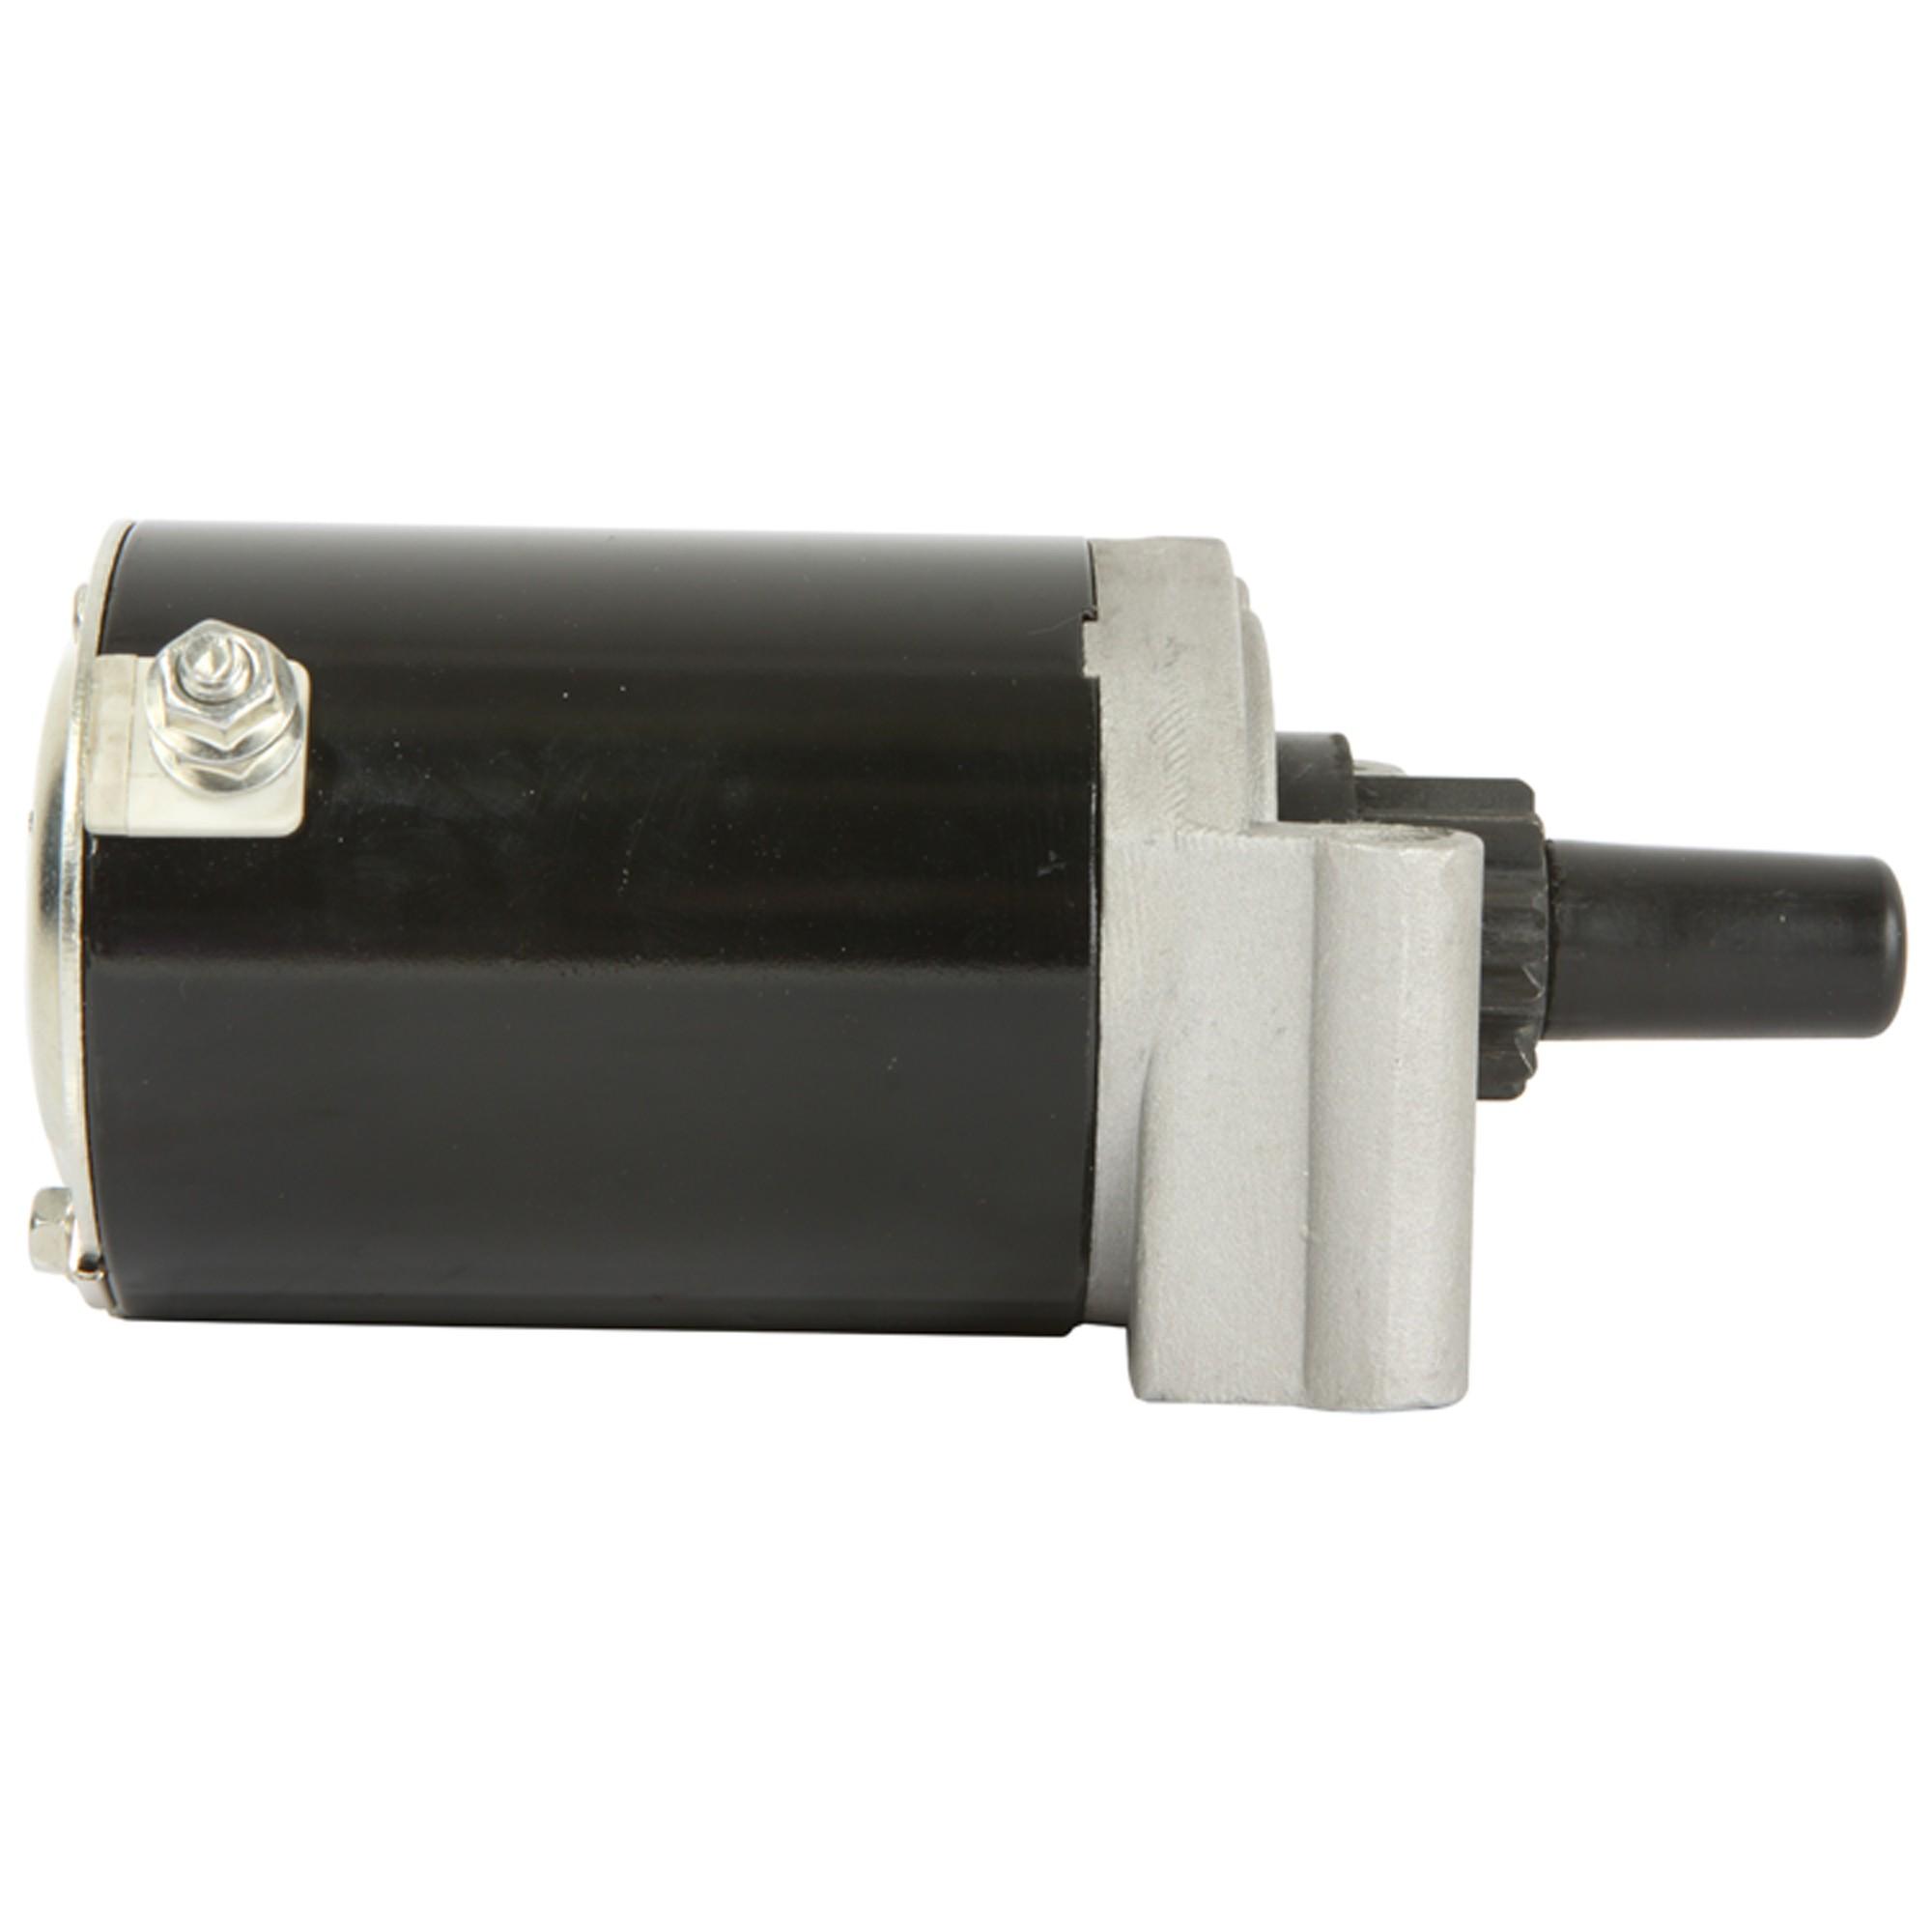 New Starter 96772 12-098-10 25-098-03 AM120729 5667140 1 Year Warranty!